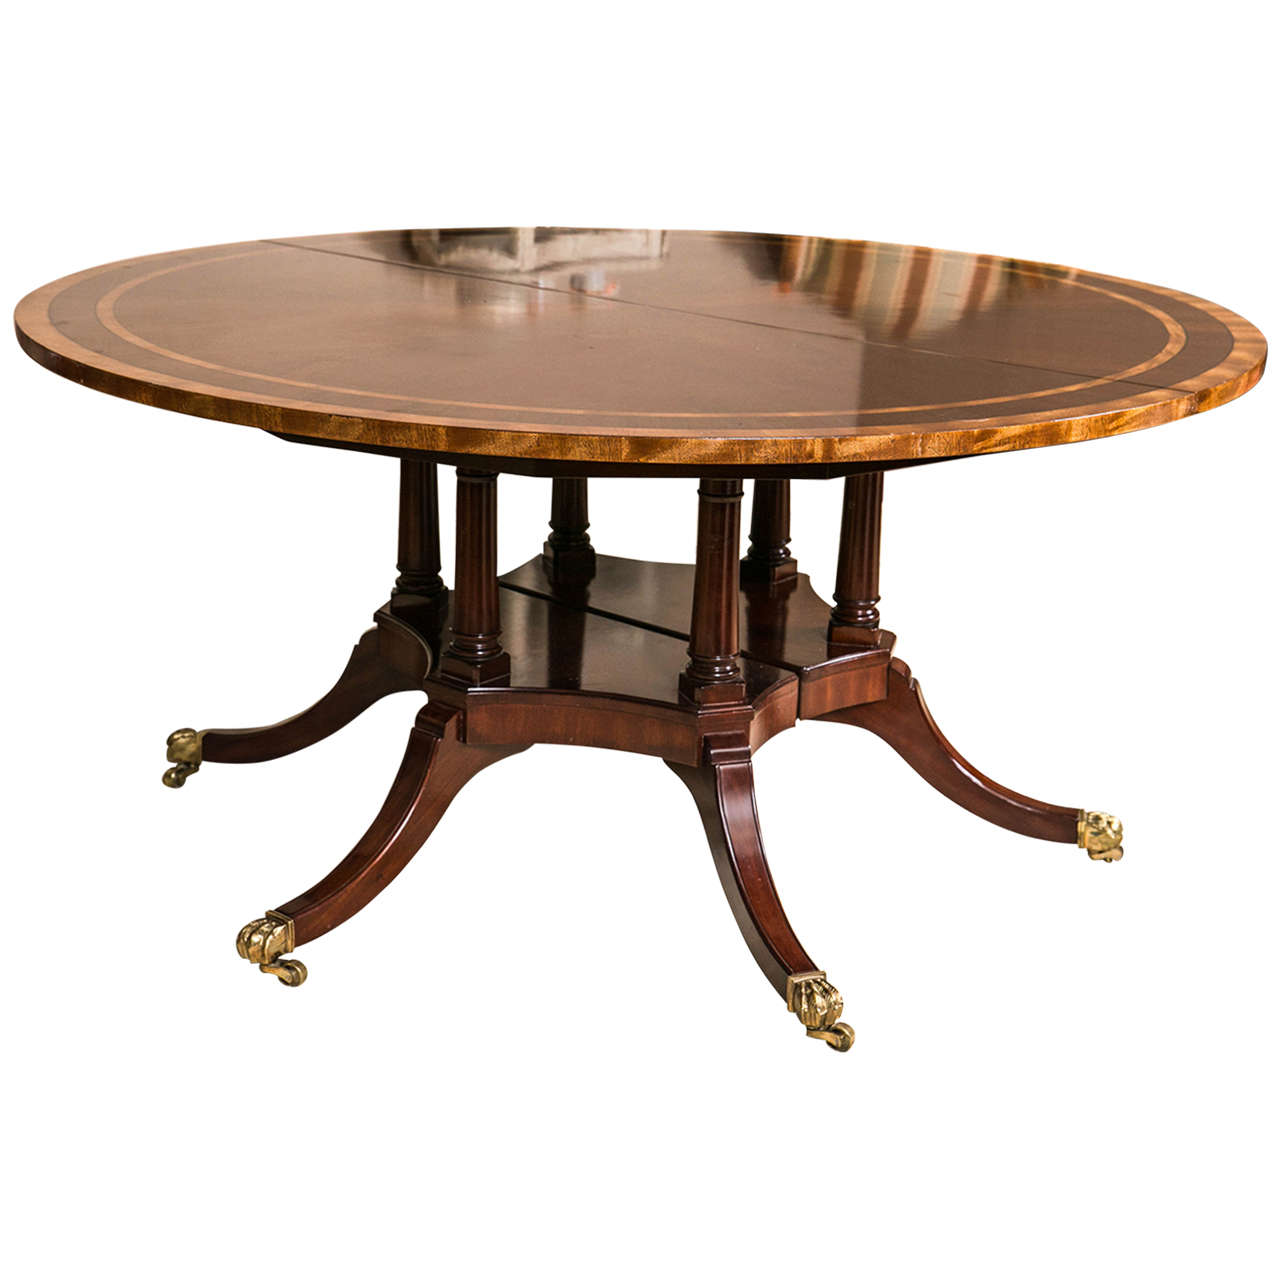 English regency style mahogany circular dining table at 1stdibs - Dining table style ...